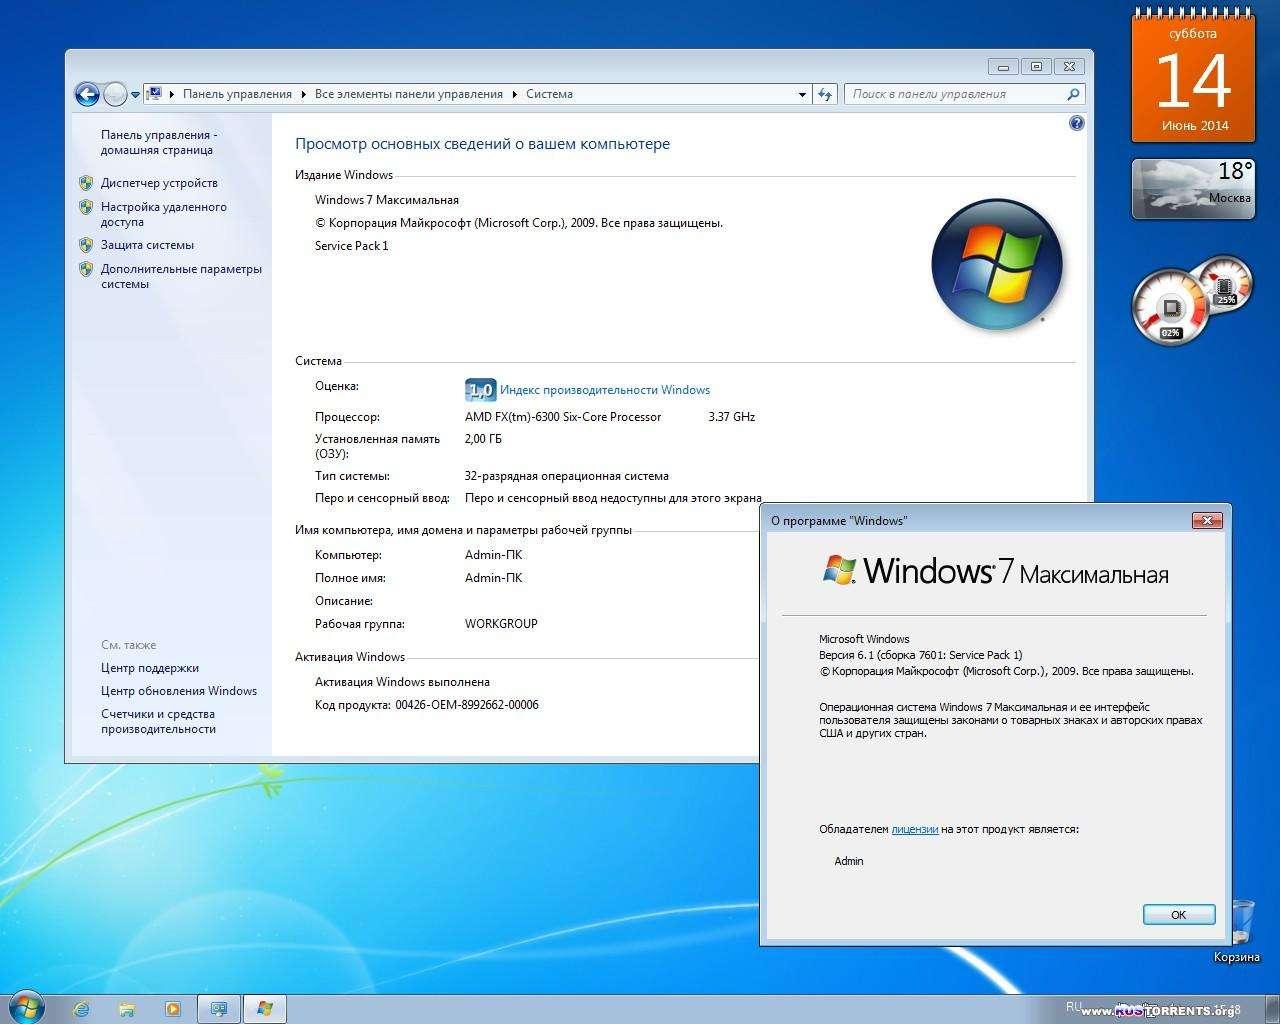 Windows 7 with SP1 х86/х64 All Original Editions 2DVD Update 25.05.2014 RUS